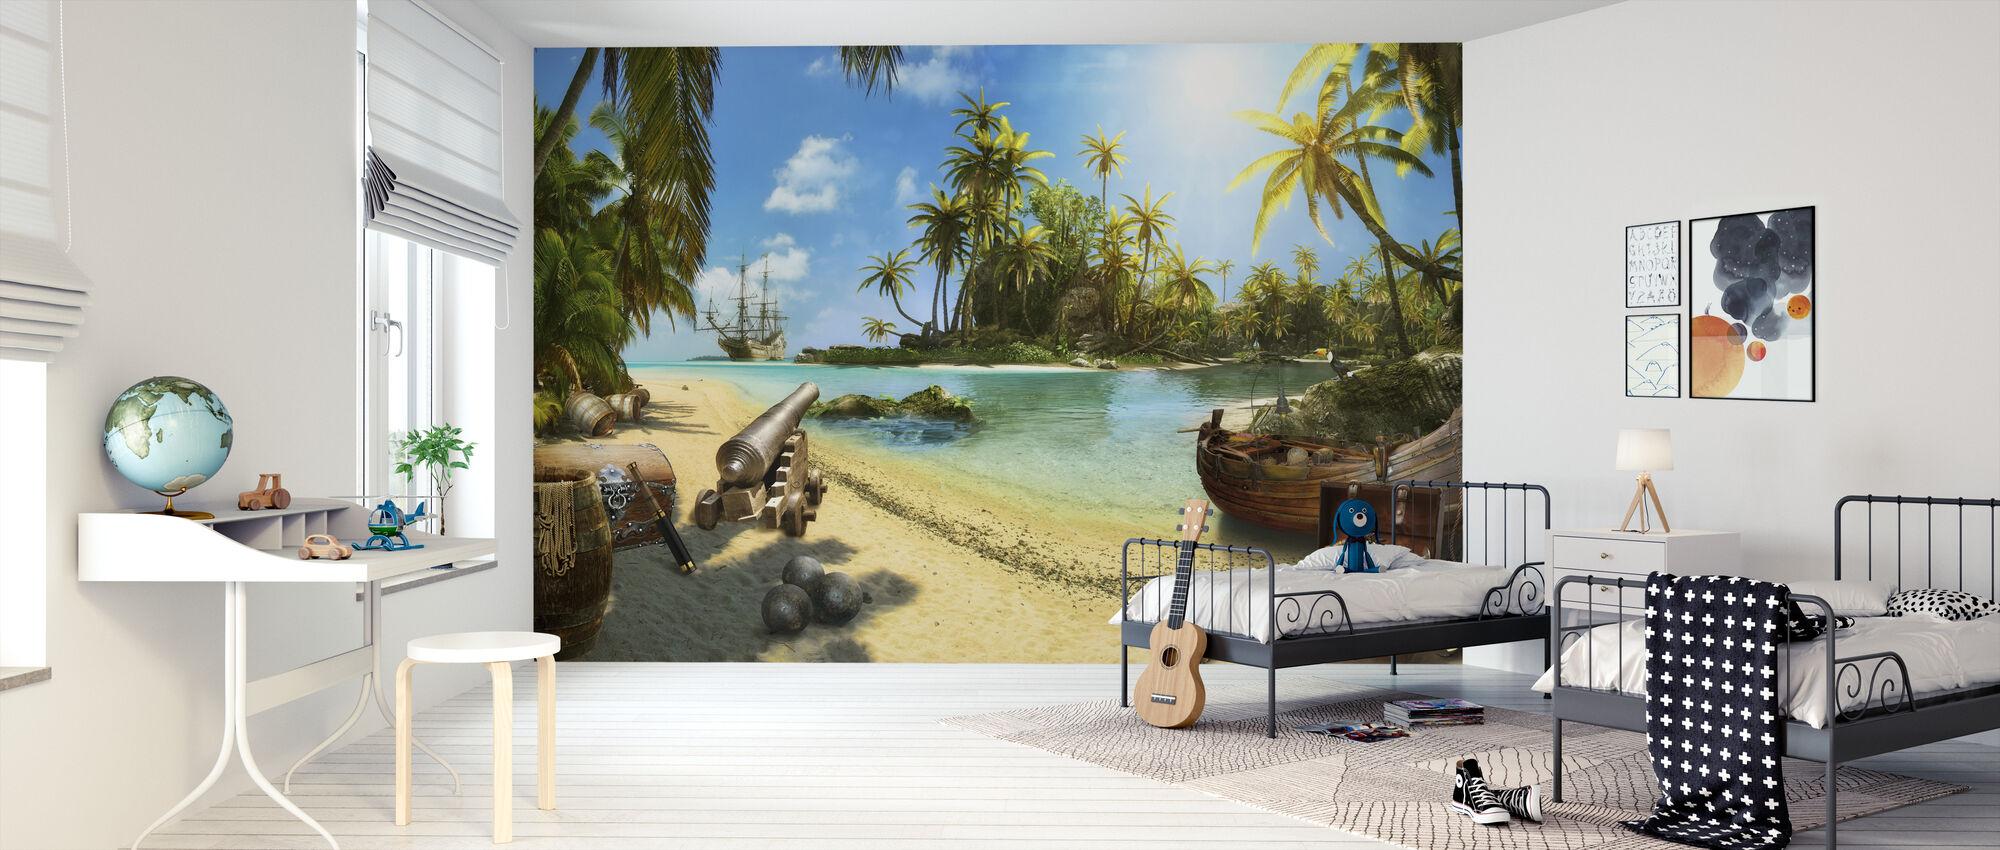 Pirate Island - Wallpaper - Kids Room